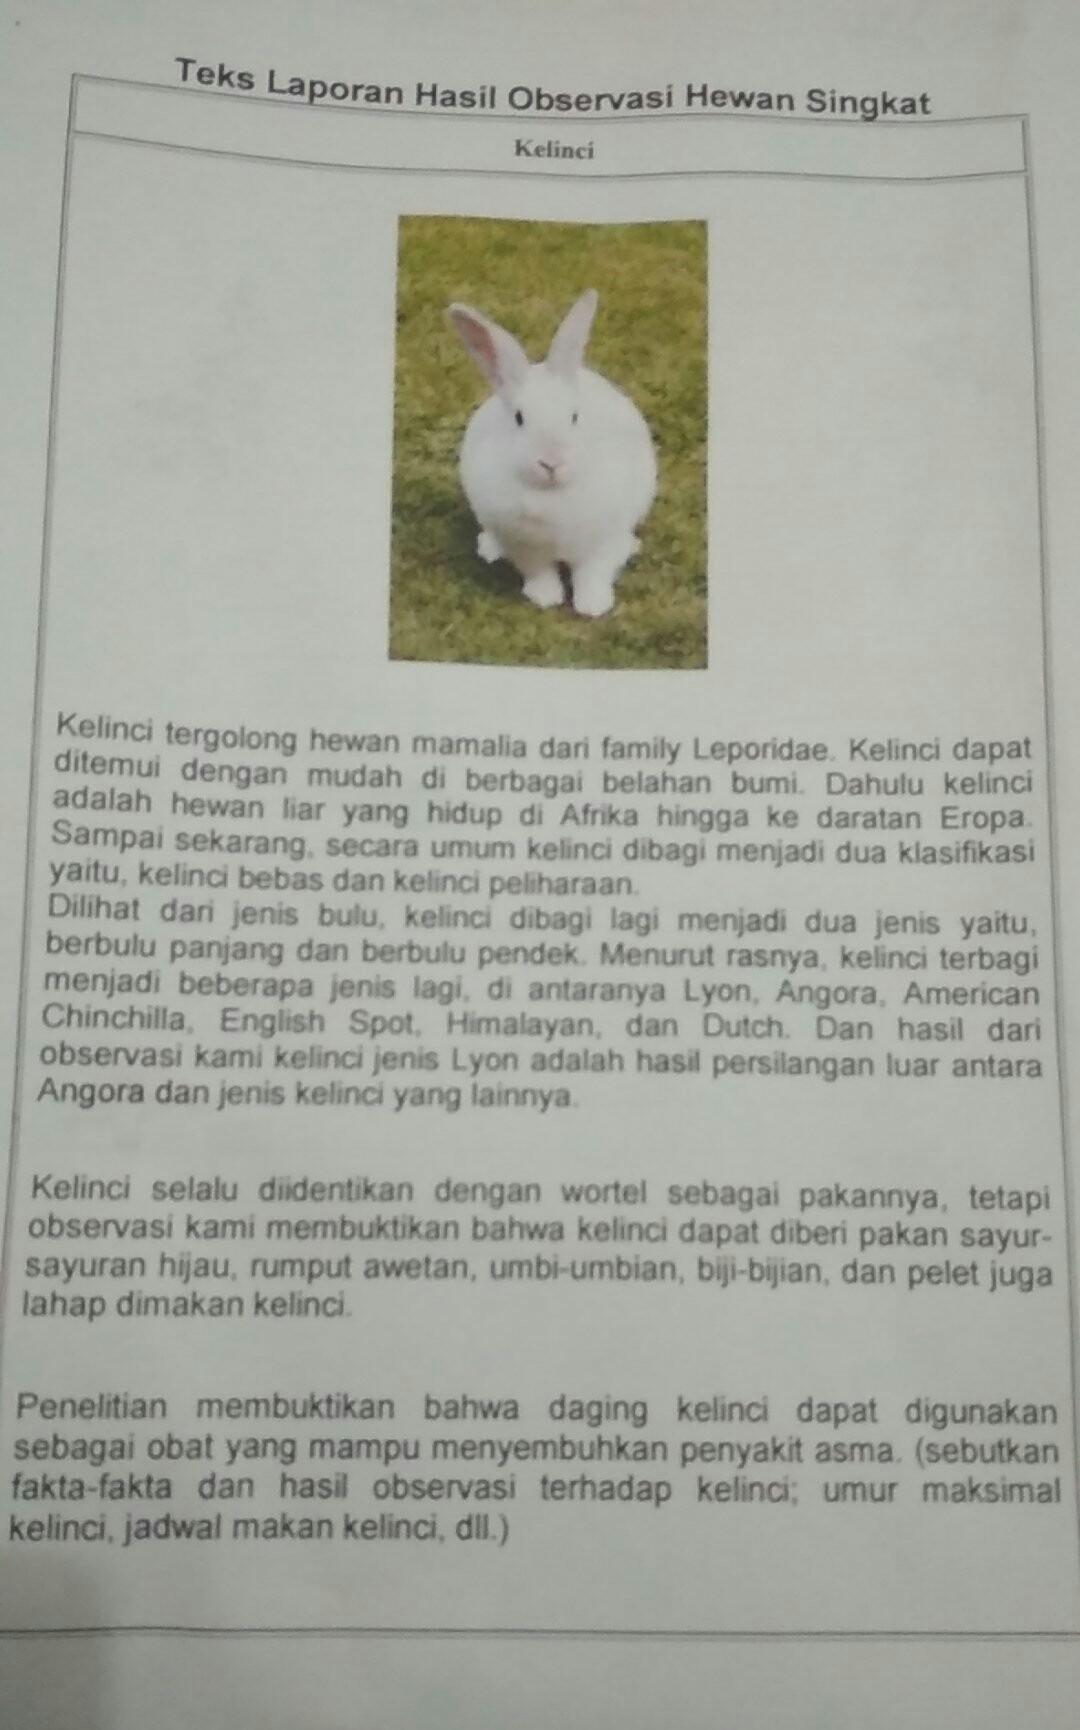 Contoh Teks Laporan Observasi Beserta Strukturnya Dalam Bahasa Indonesia Kumpulan Contoh Laporan